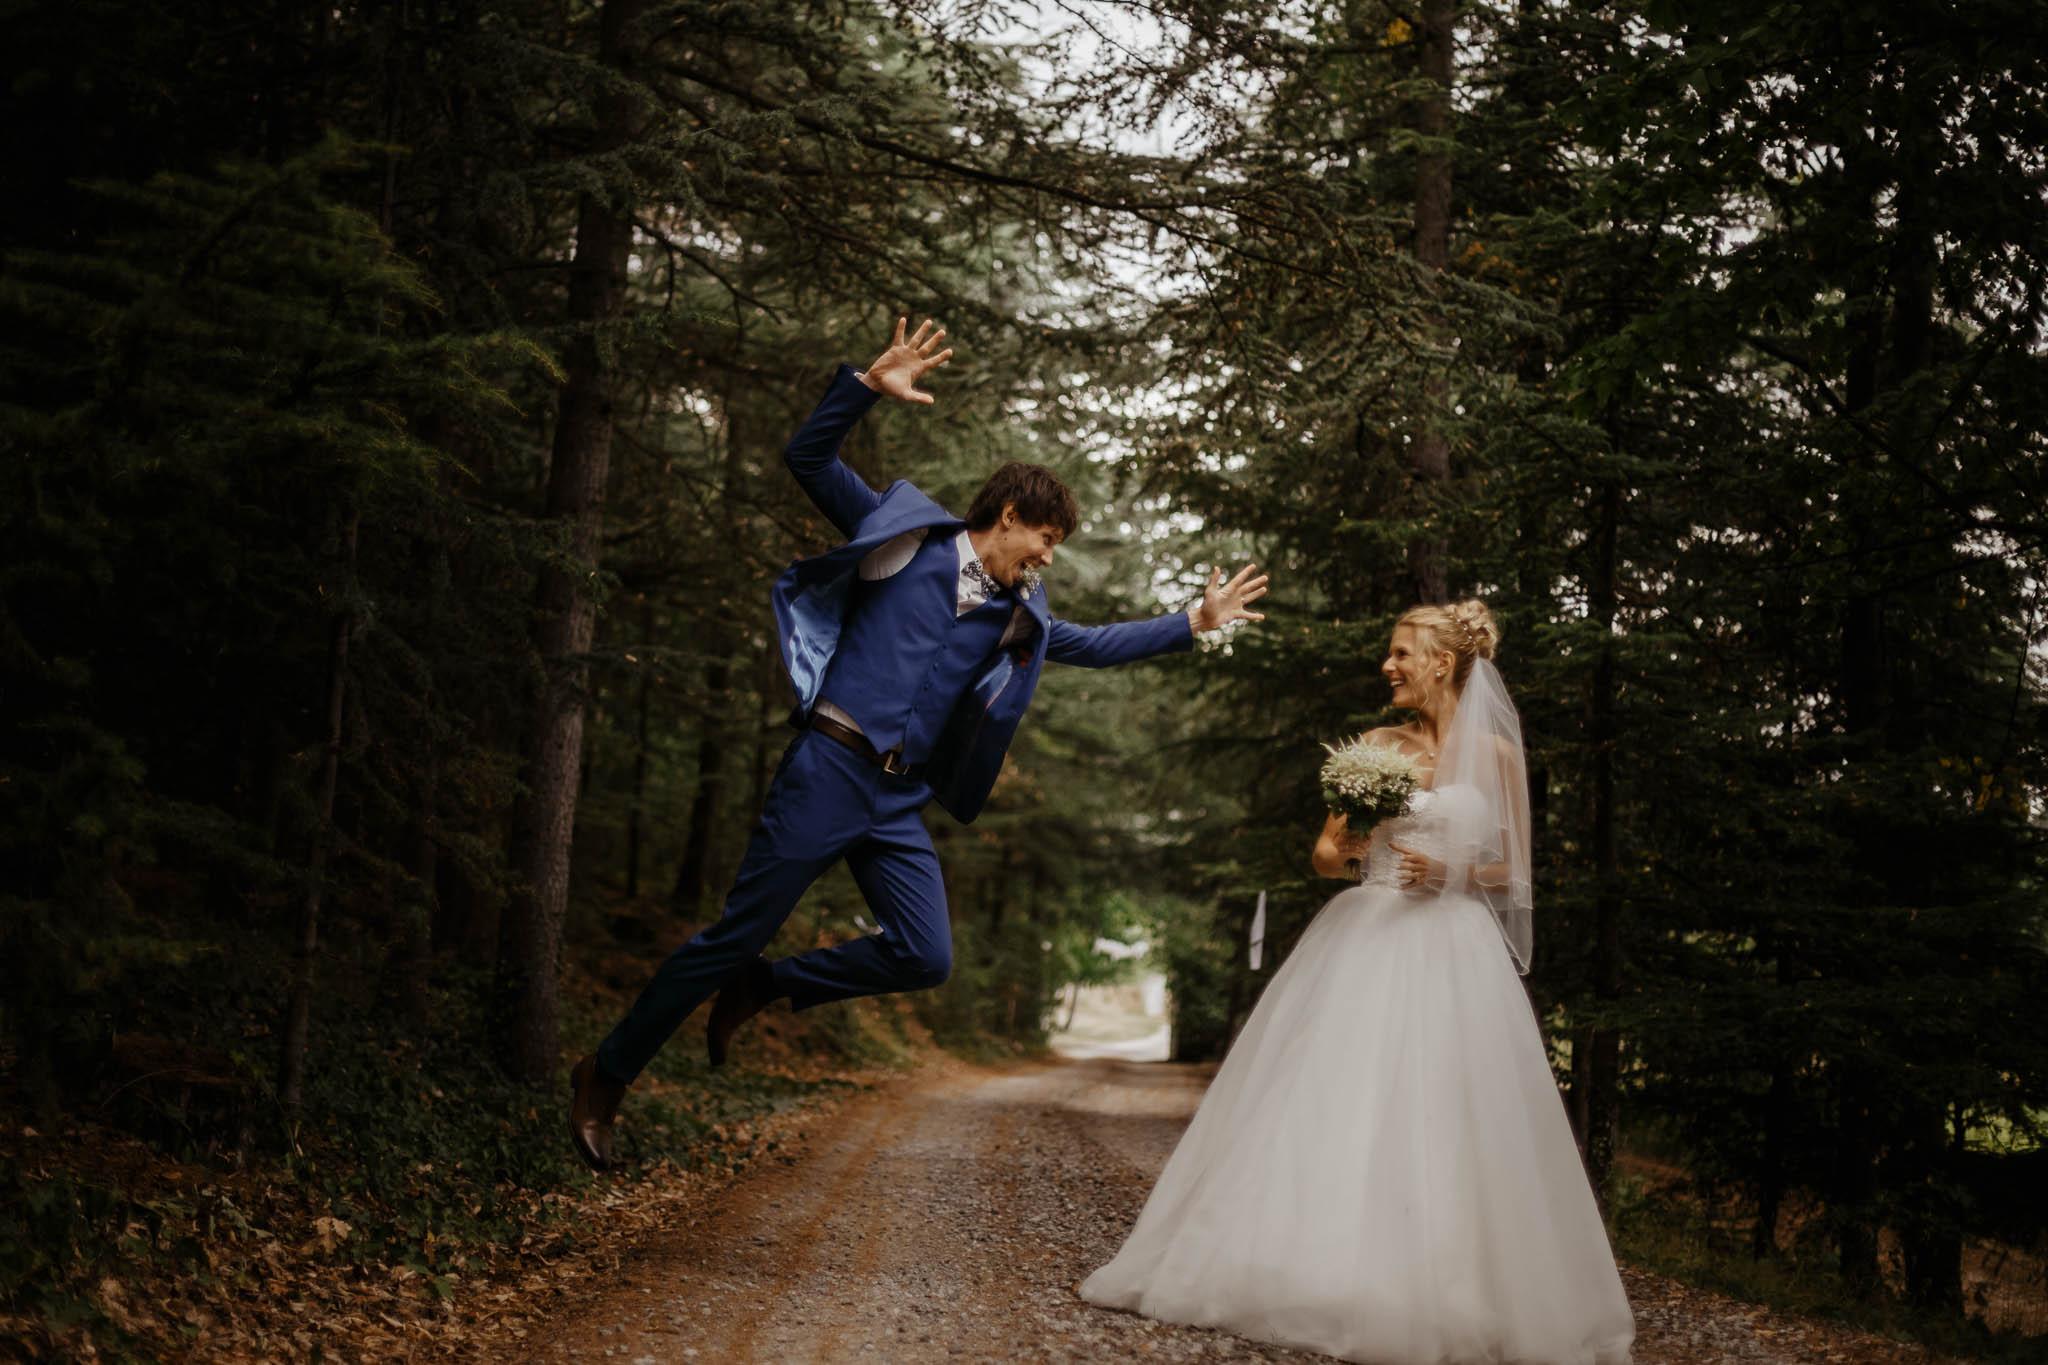 mariage-chateau-gaudras-ingold-72.jpg